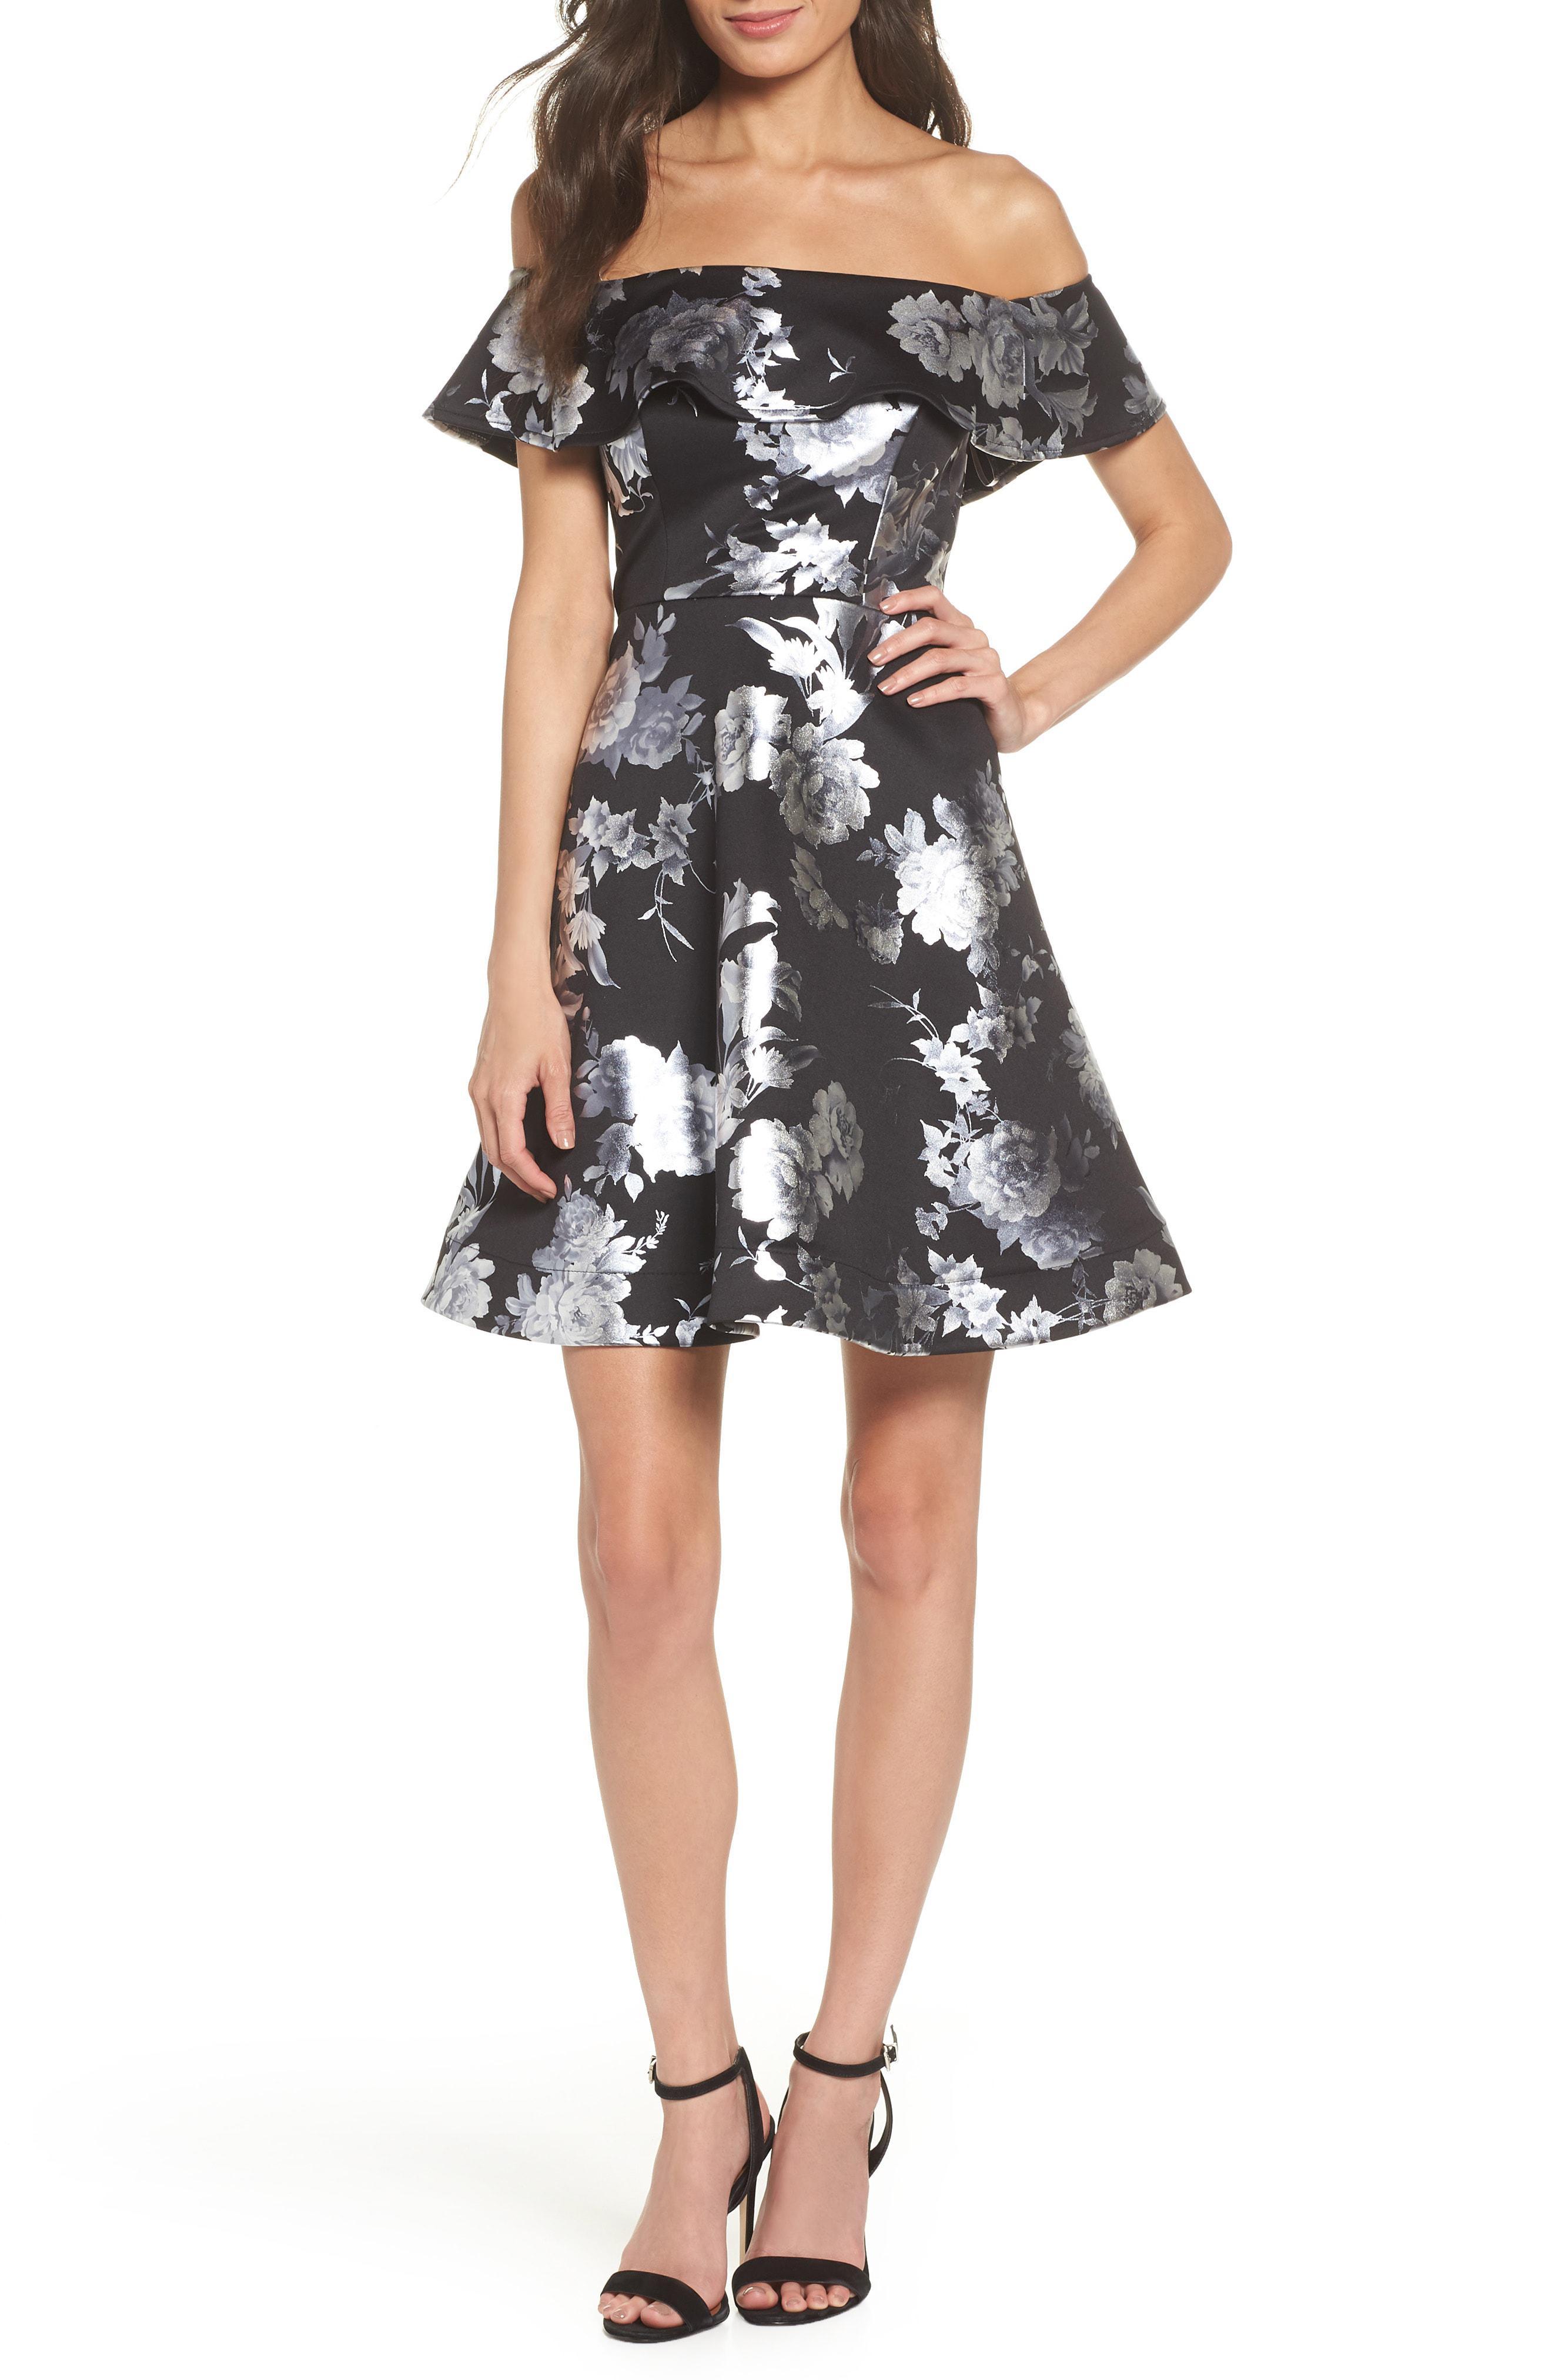 908e6ead45b30 Sequin Hearts Off The Shoulder Foil Scuba Fit & Flare Dress in Black ...